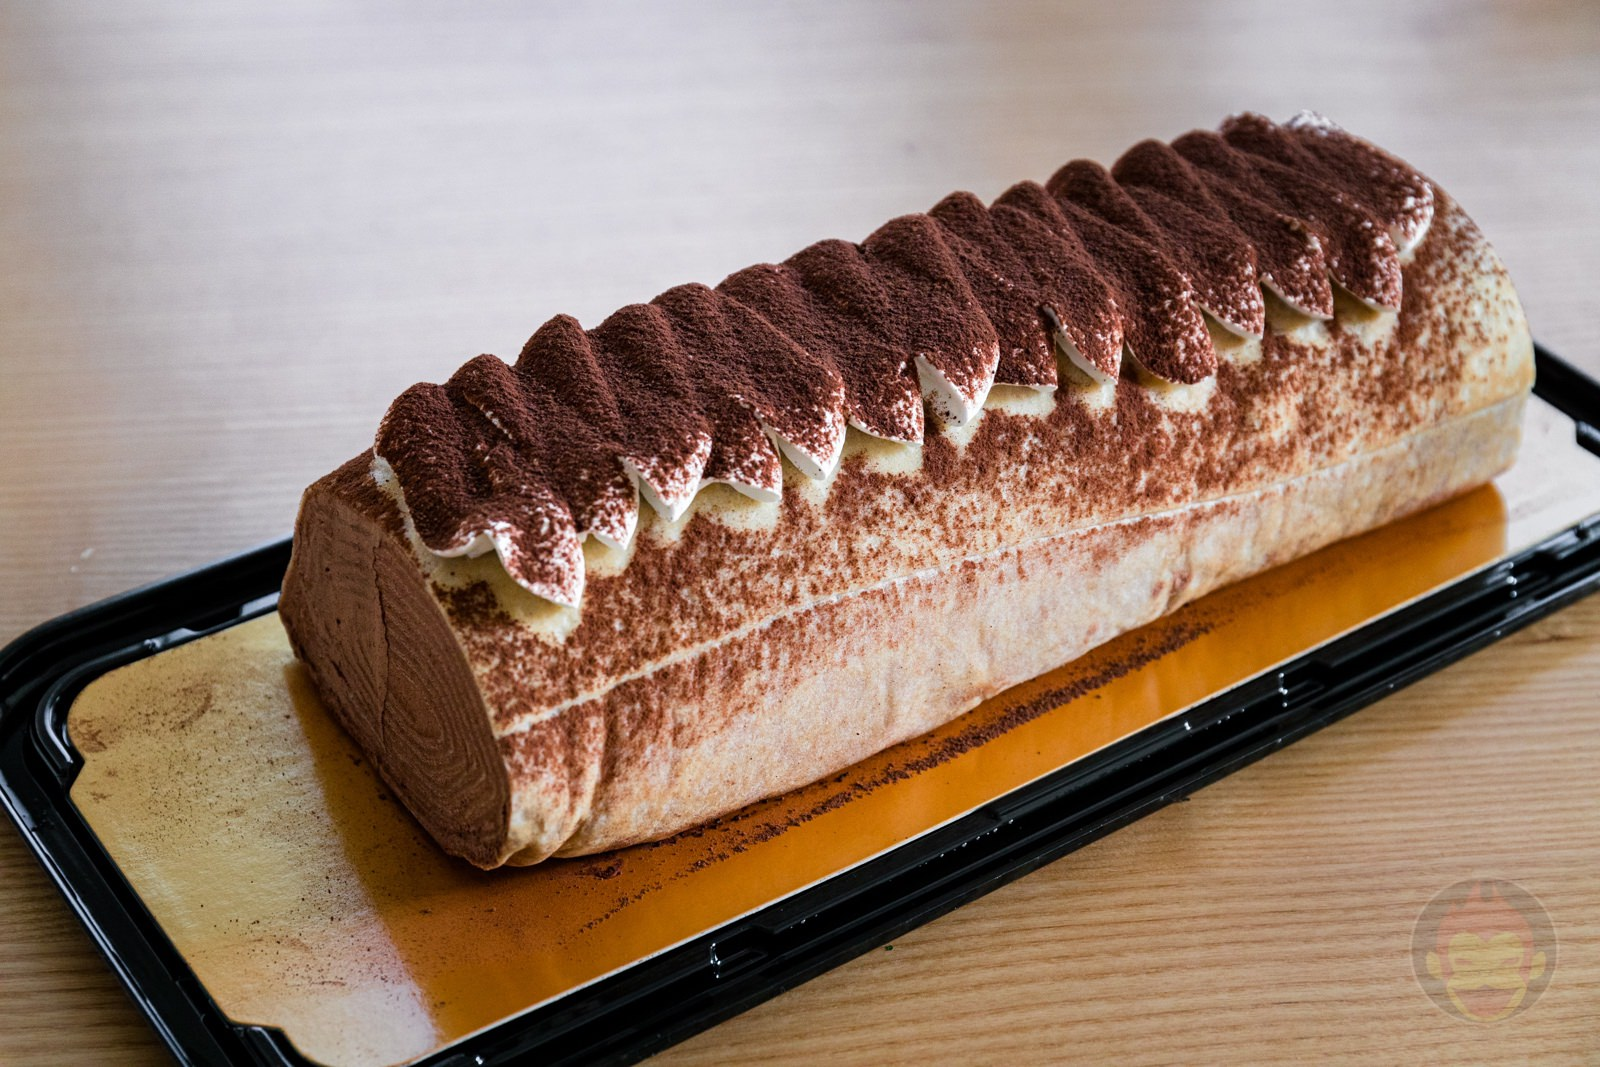 Chocolate-Crape-Roll-Costco-Dessert-03.jpg